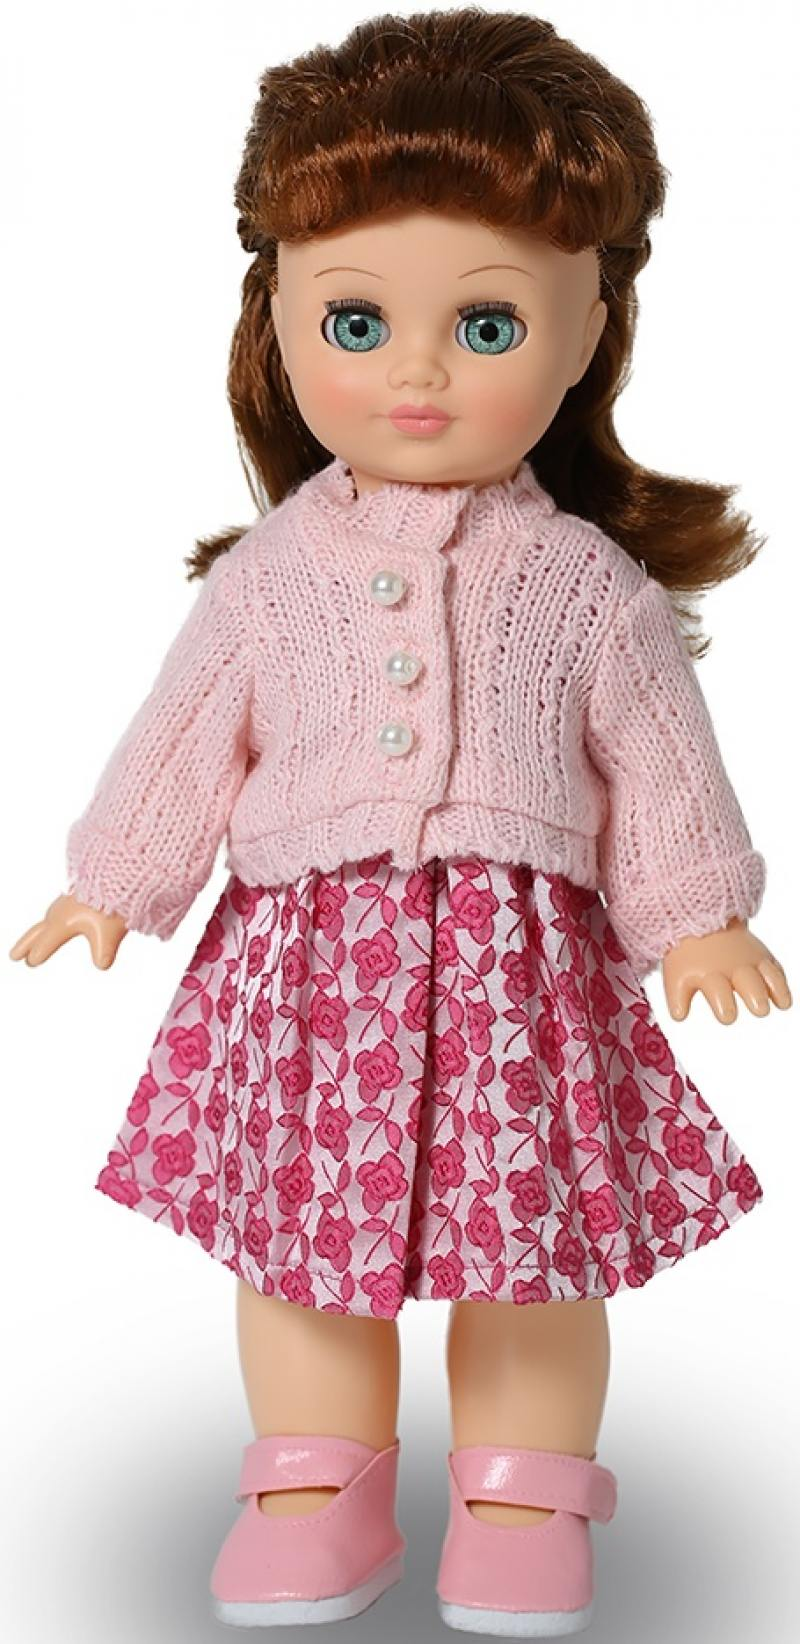 Кукла ВЕСНА Элла 1 (озвученная) весна кукла озвученная герда цвет платья желтый синий